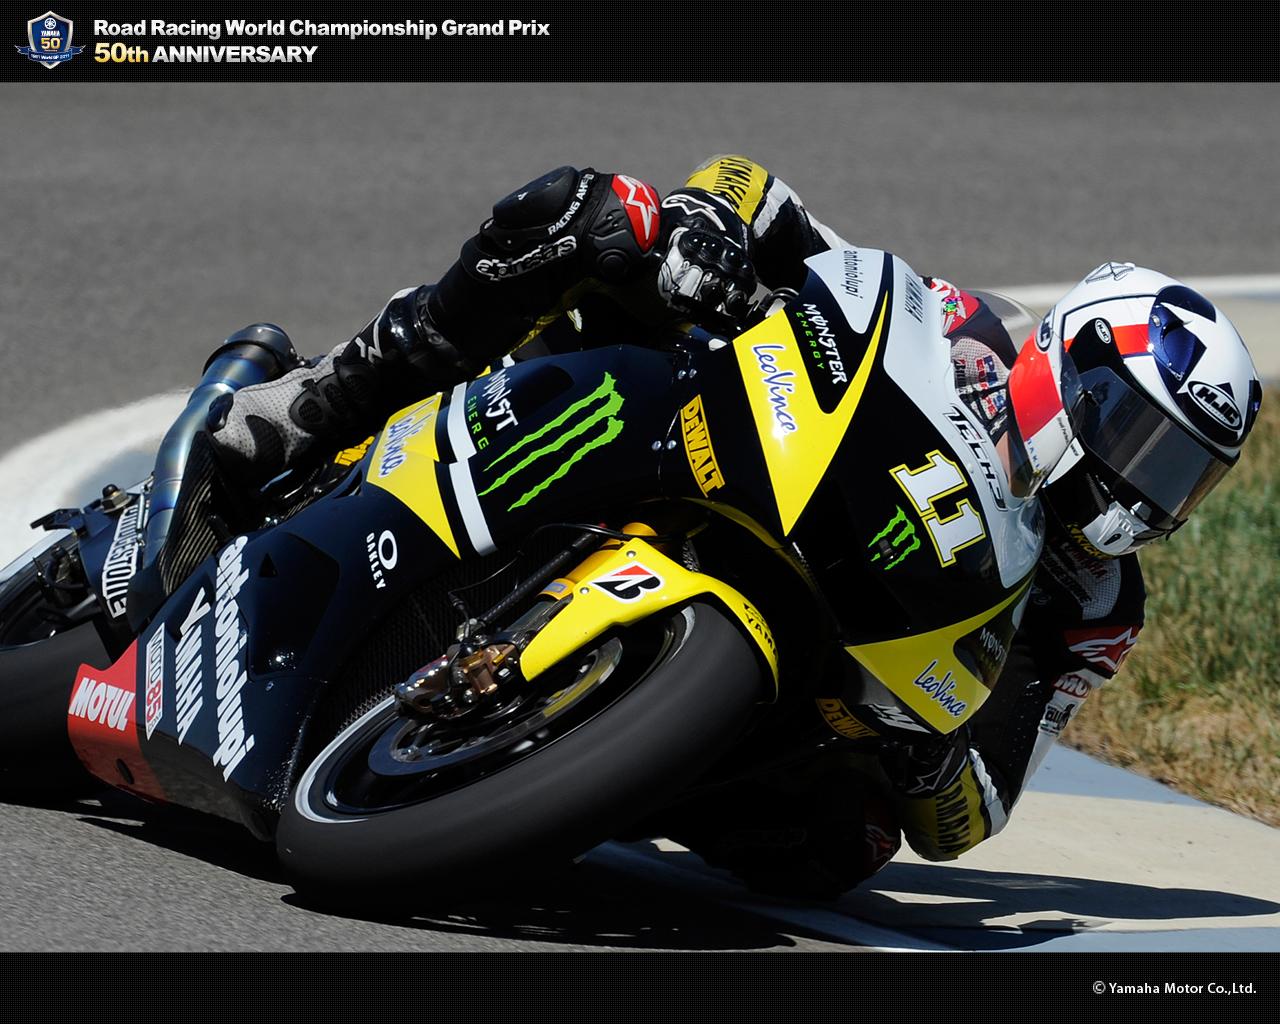 Ben Spies - Racing Information | Yamaha Motor Co., Ltd.